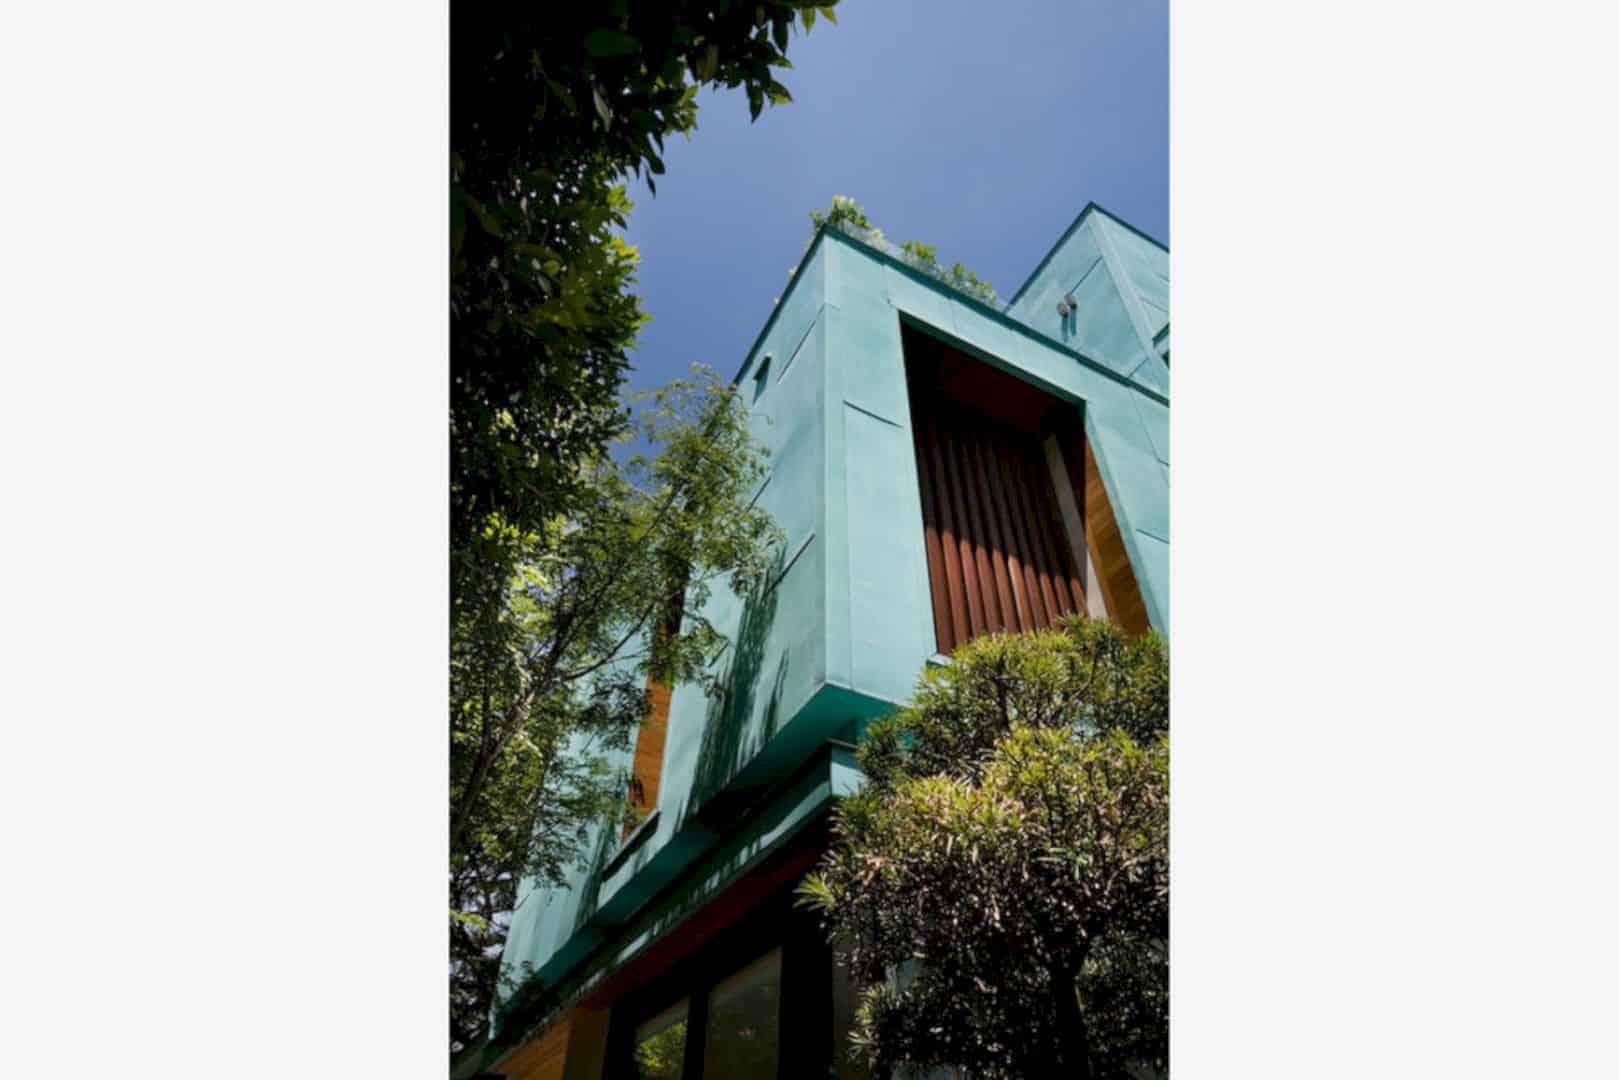 Green House 9